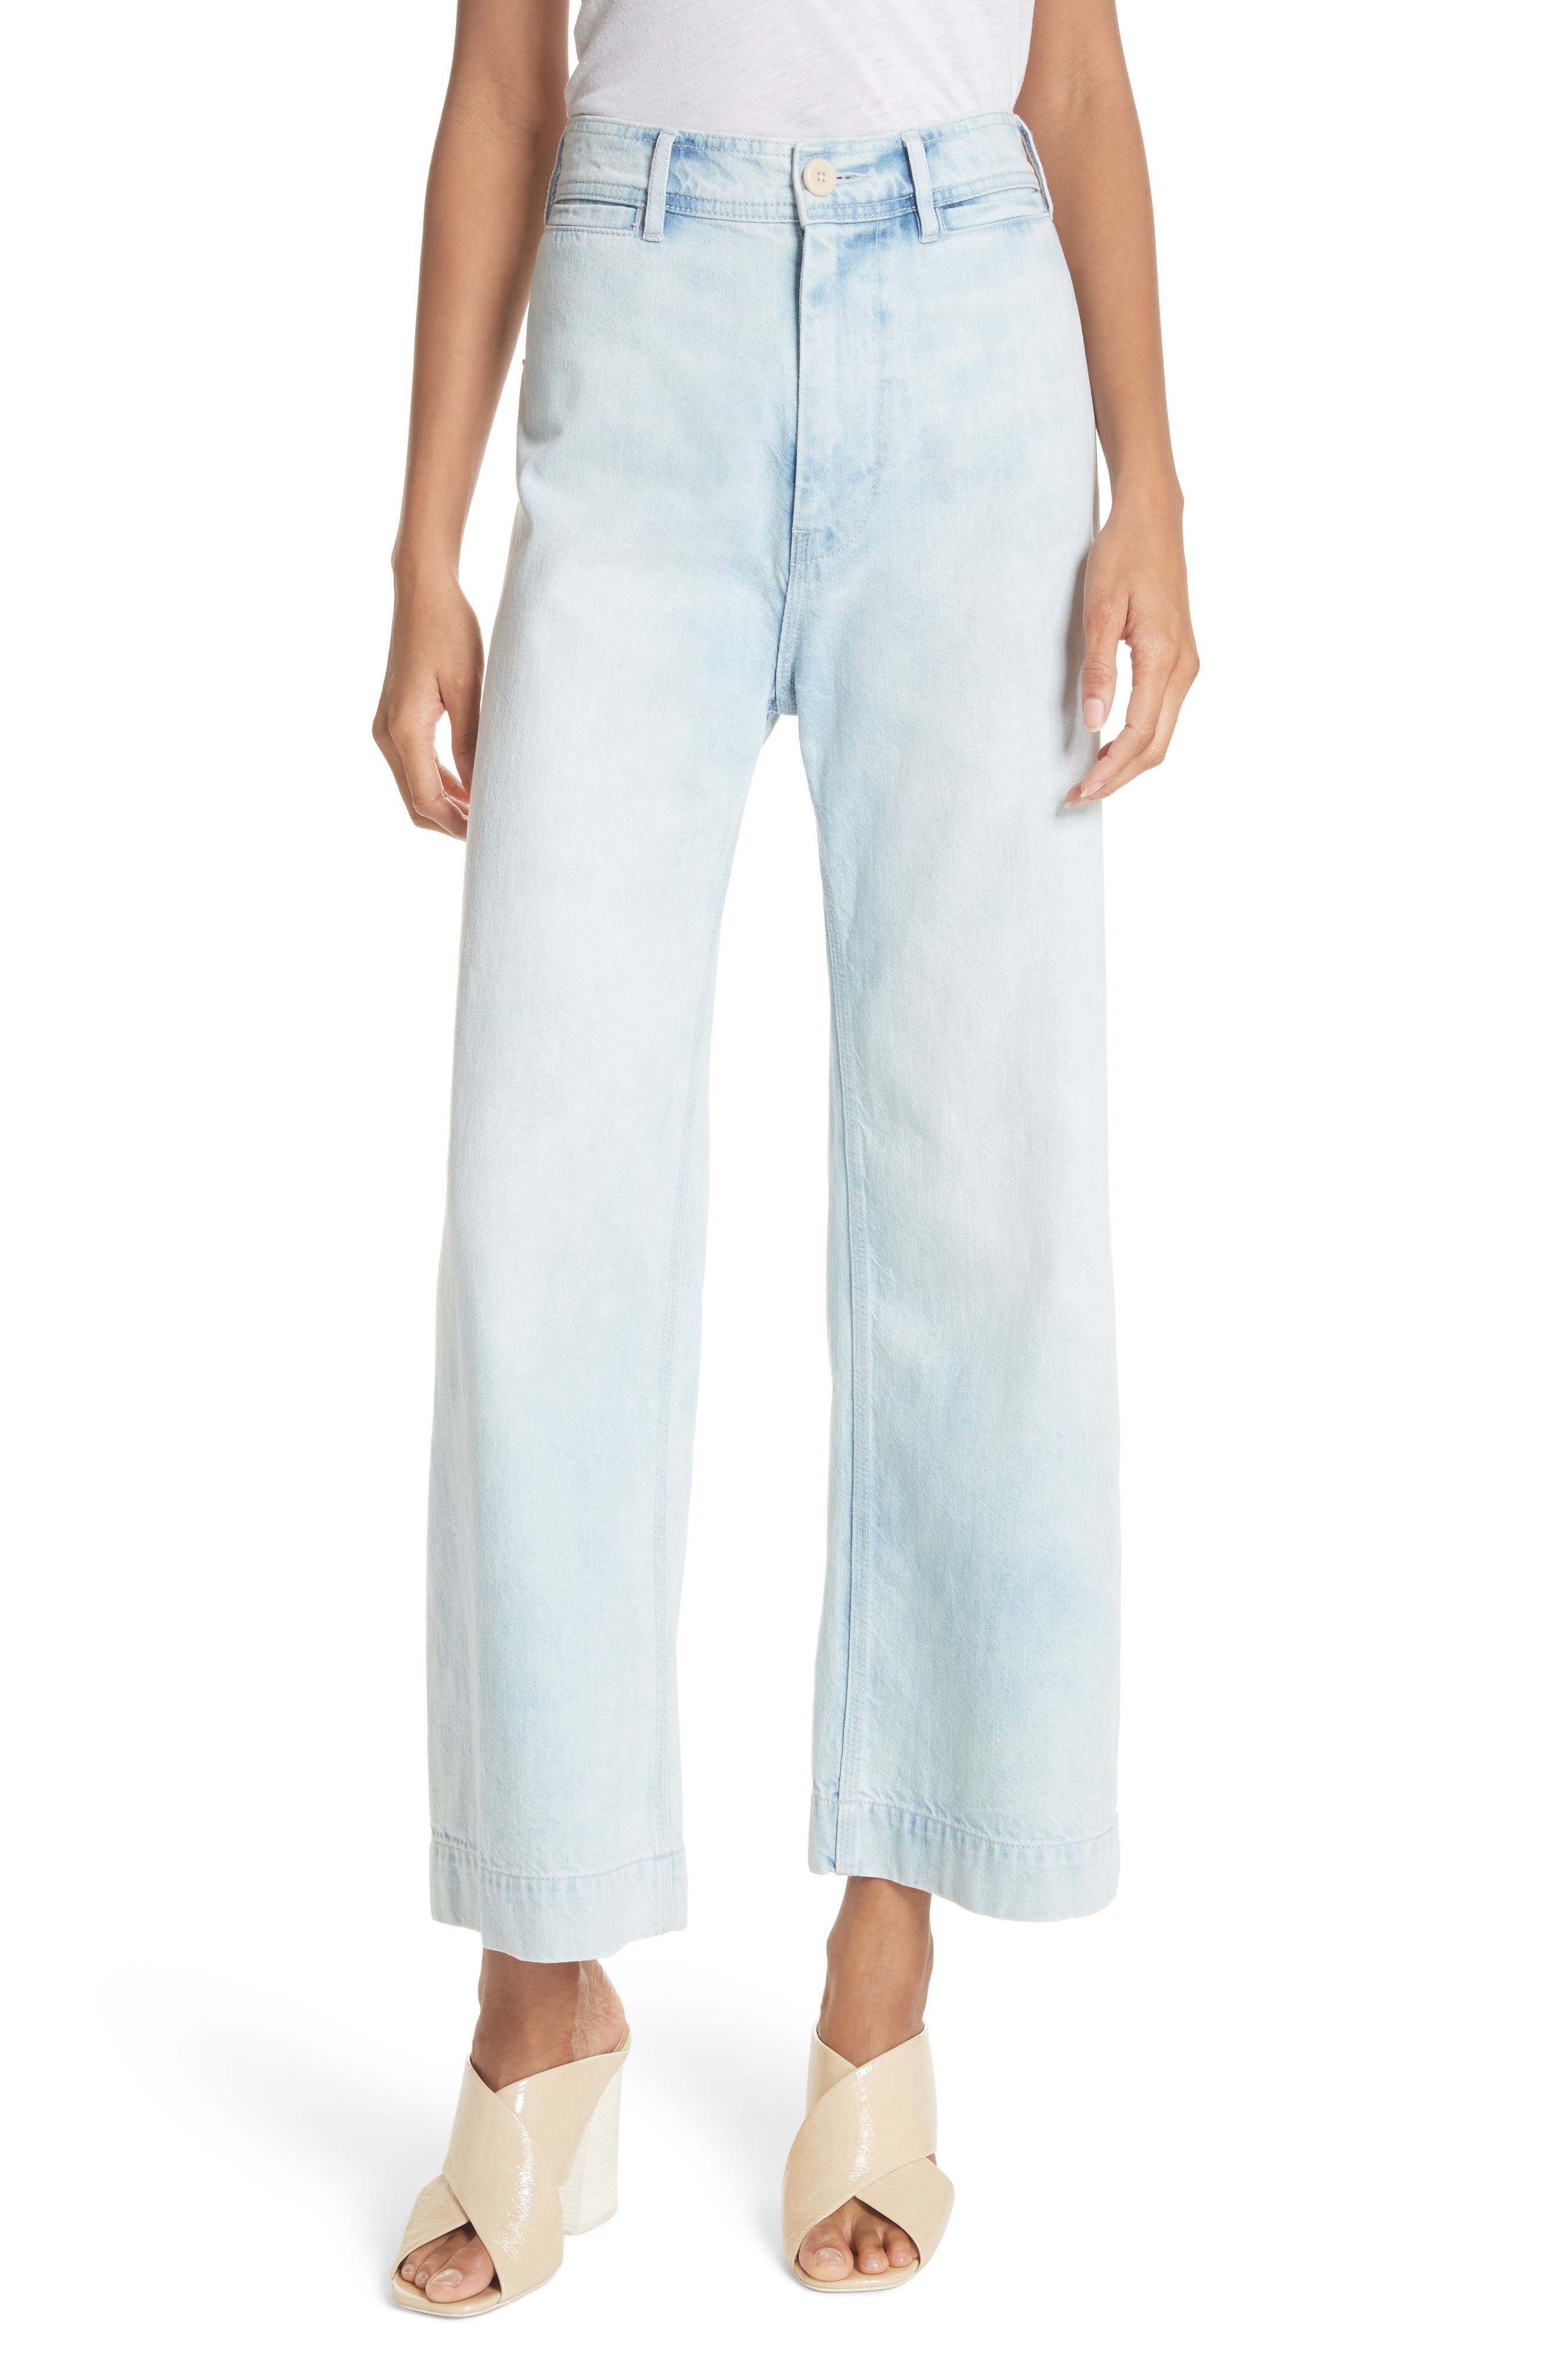 Alternate Image 1 Selected - La Vie Rebecca Taylor Crop Wide Leg Jeans (Nuage Wash)